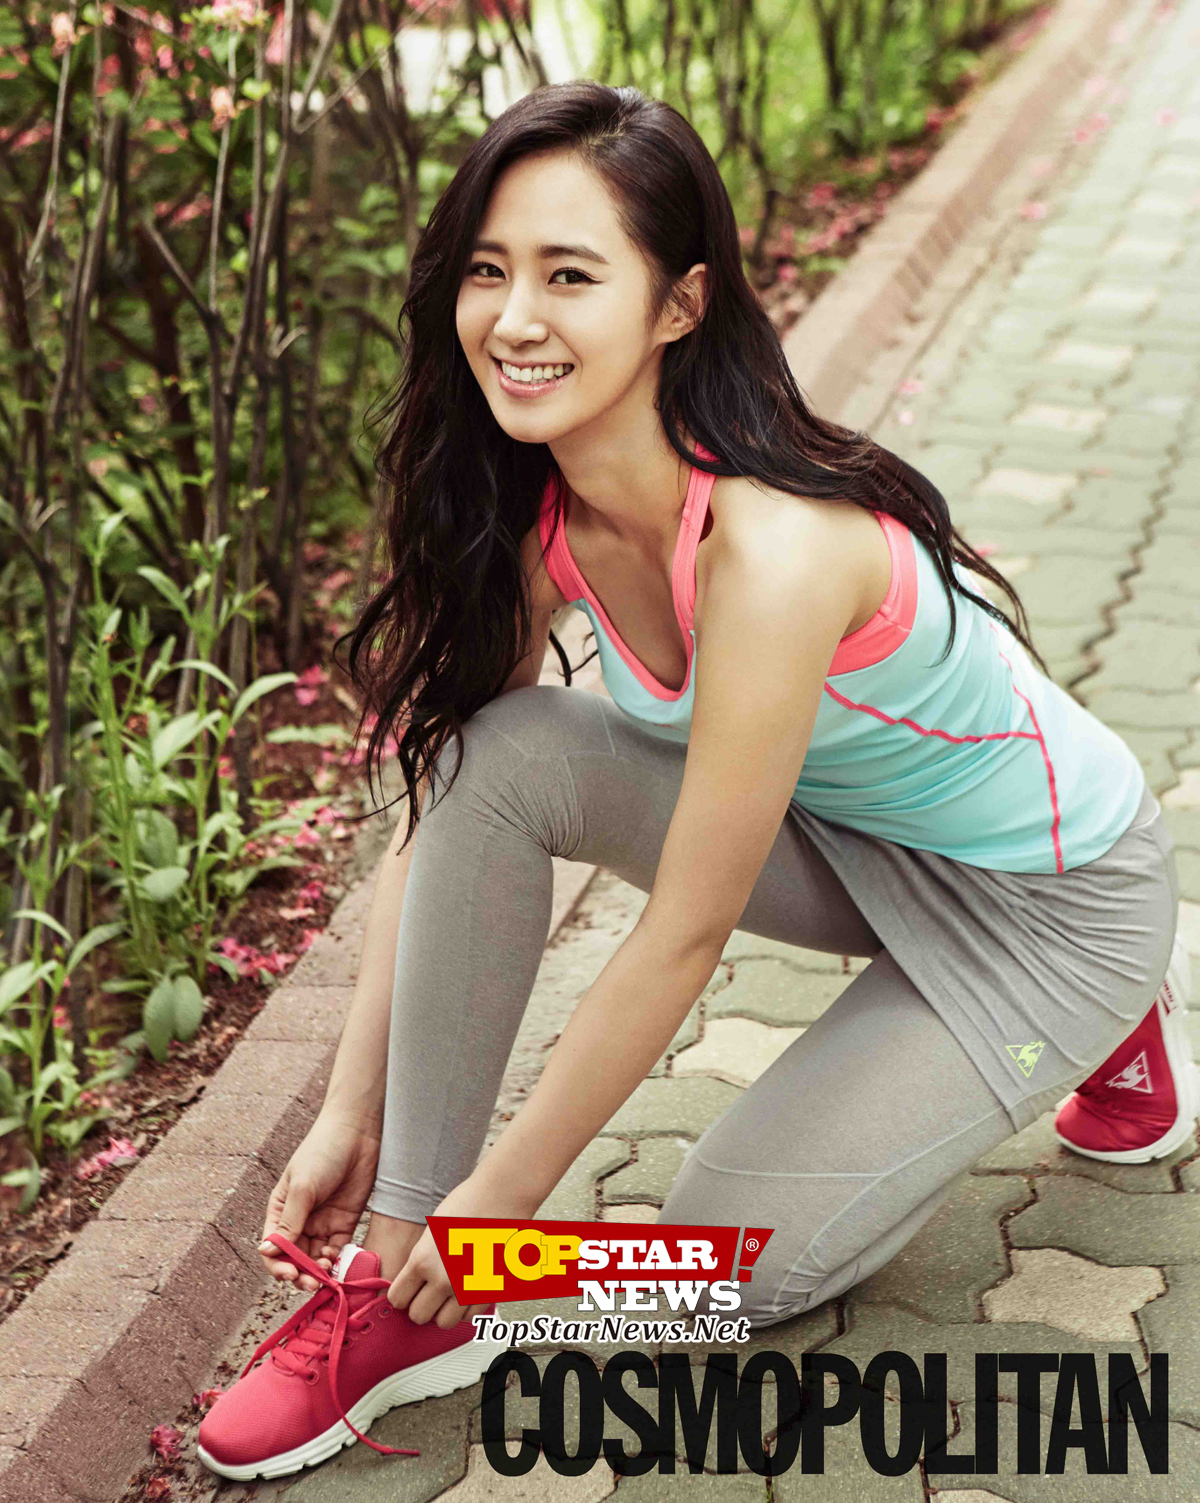 SNSD's Yuri for 'Cosmopolitan' Magazine!